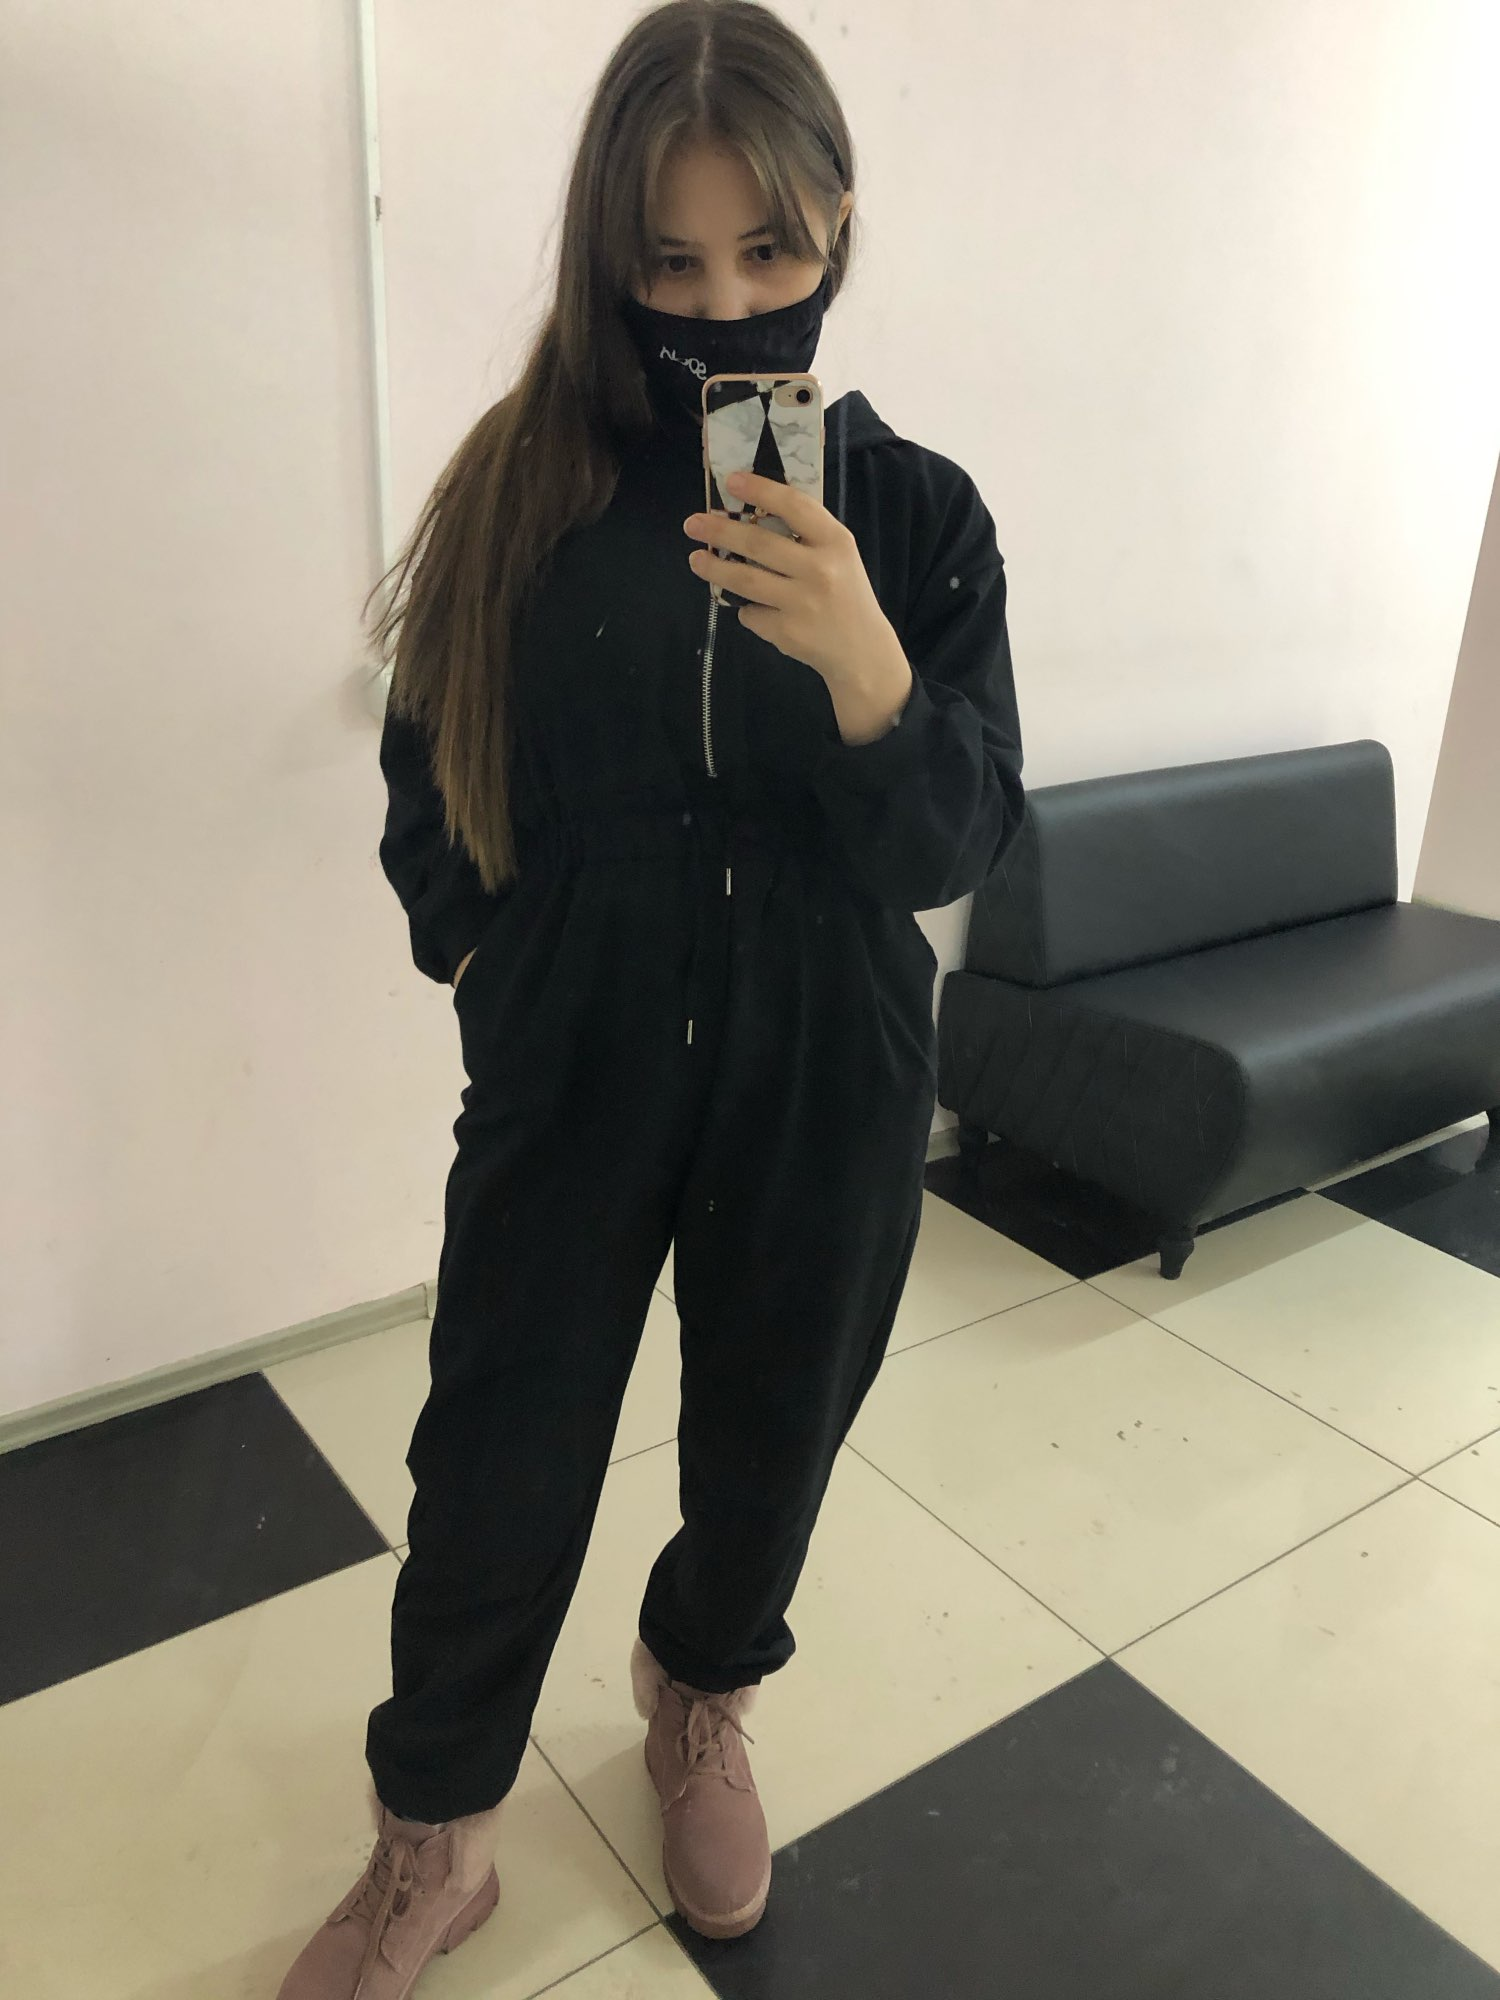 2019 Spring Casual Black White Grey Color Women Jumpsuit Do Exercise Elastic Waist Female Playsuit|Jumpsuits|   - AliExpress